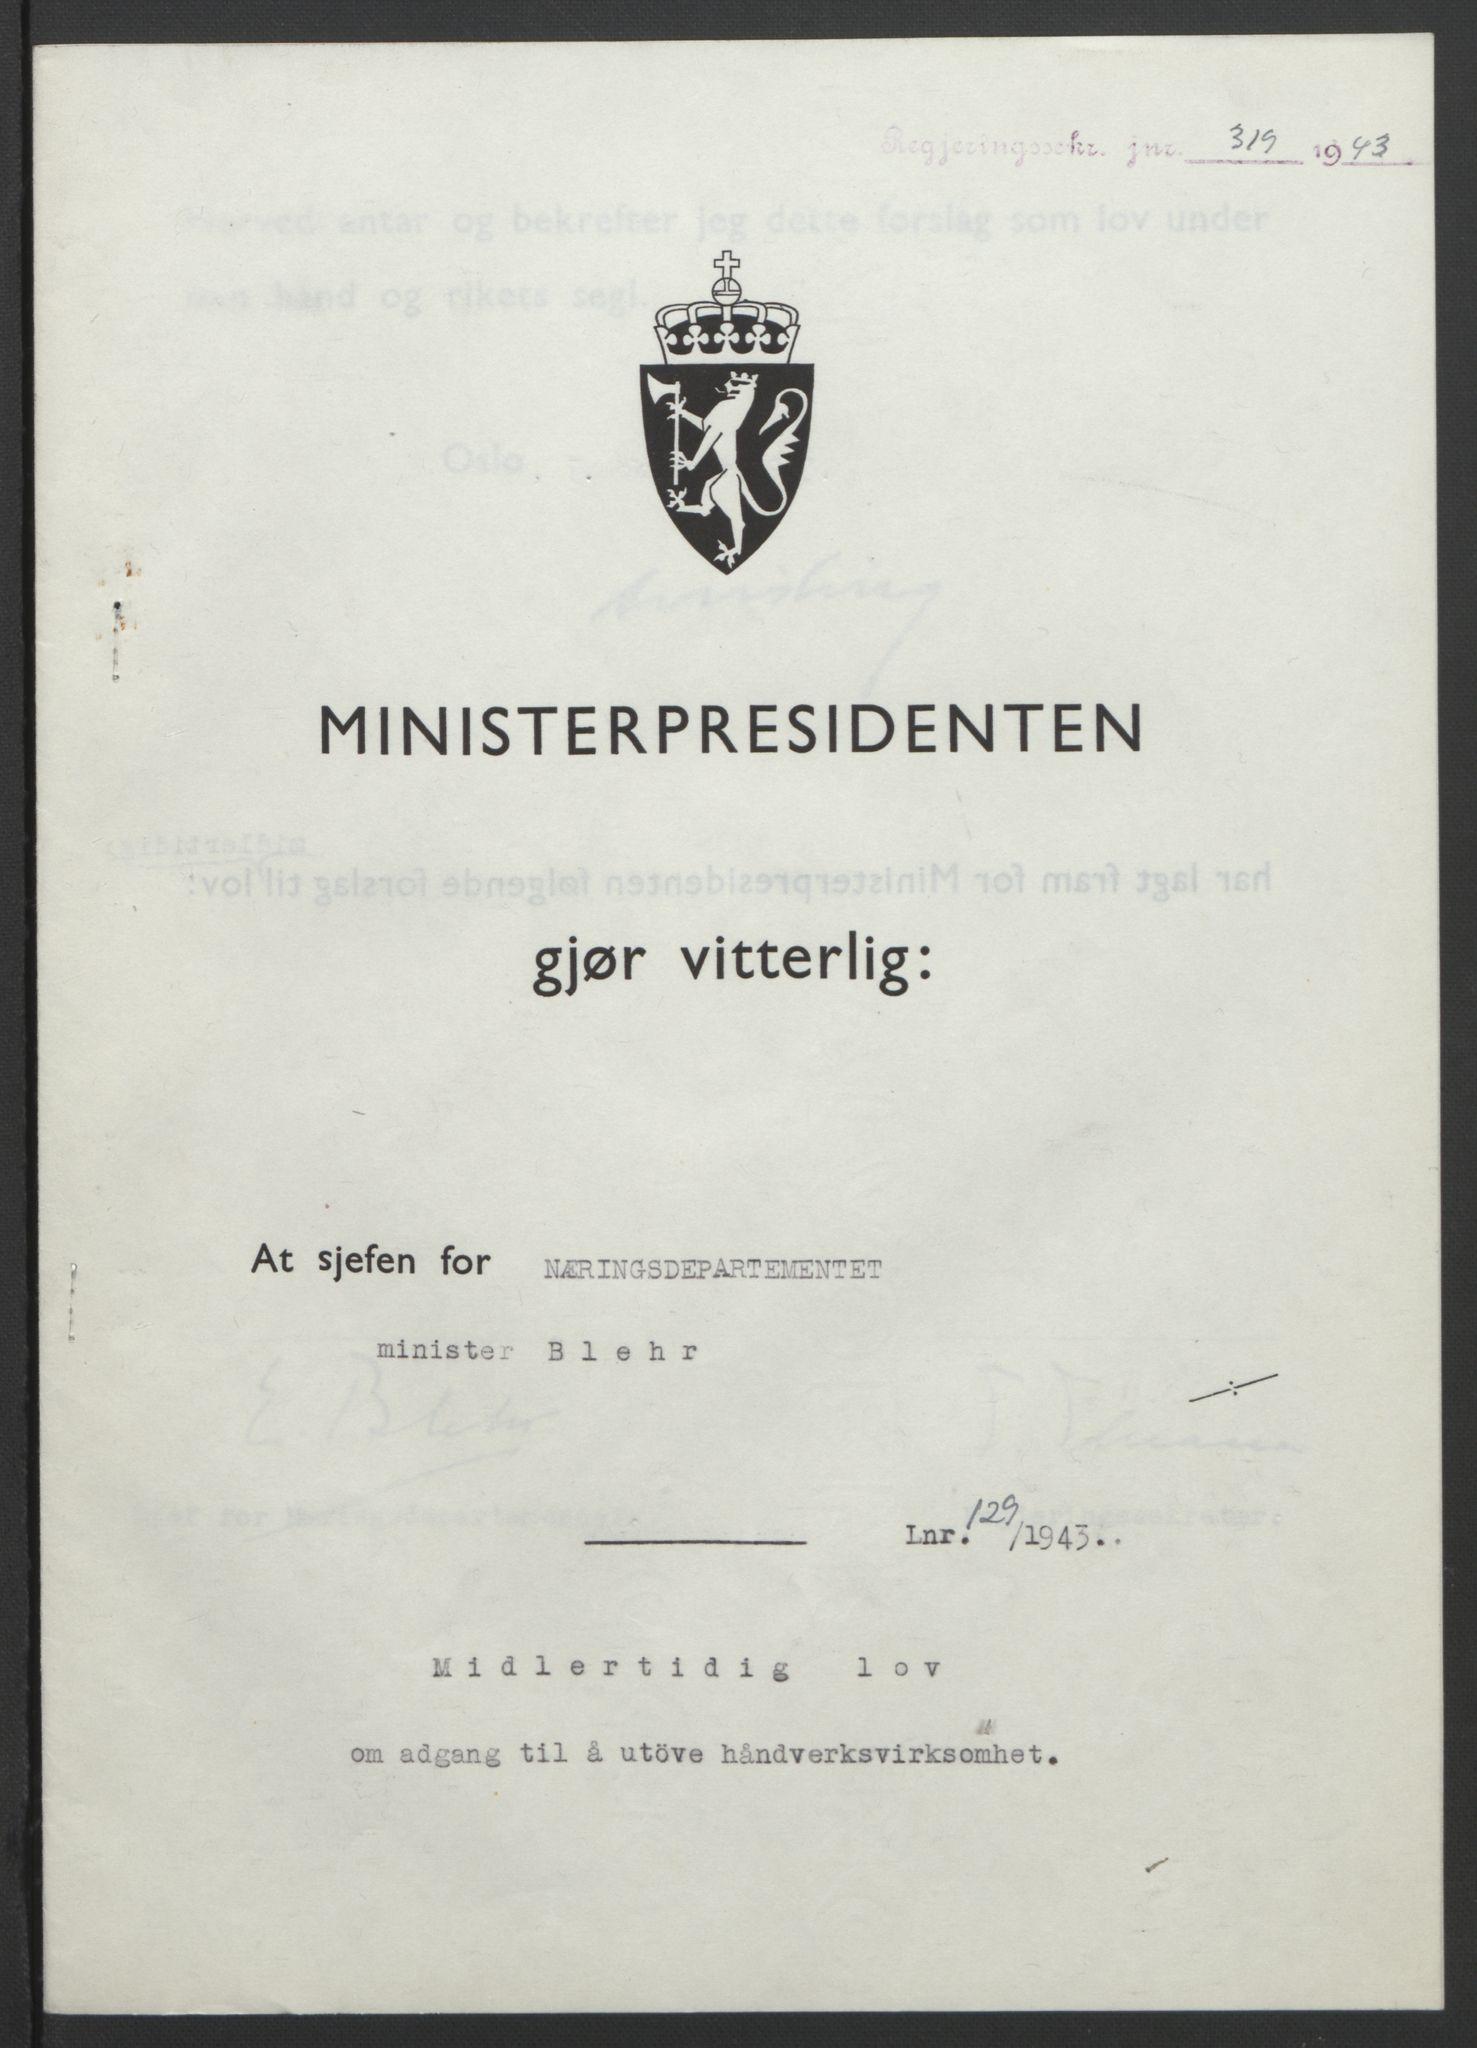 RA, NS-administrasjonen 1940-1945 (Statsrådsekretariatet, de kommisariske statsråder mm), D/Db/L0099: Lover, 1943, s. 604